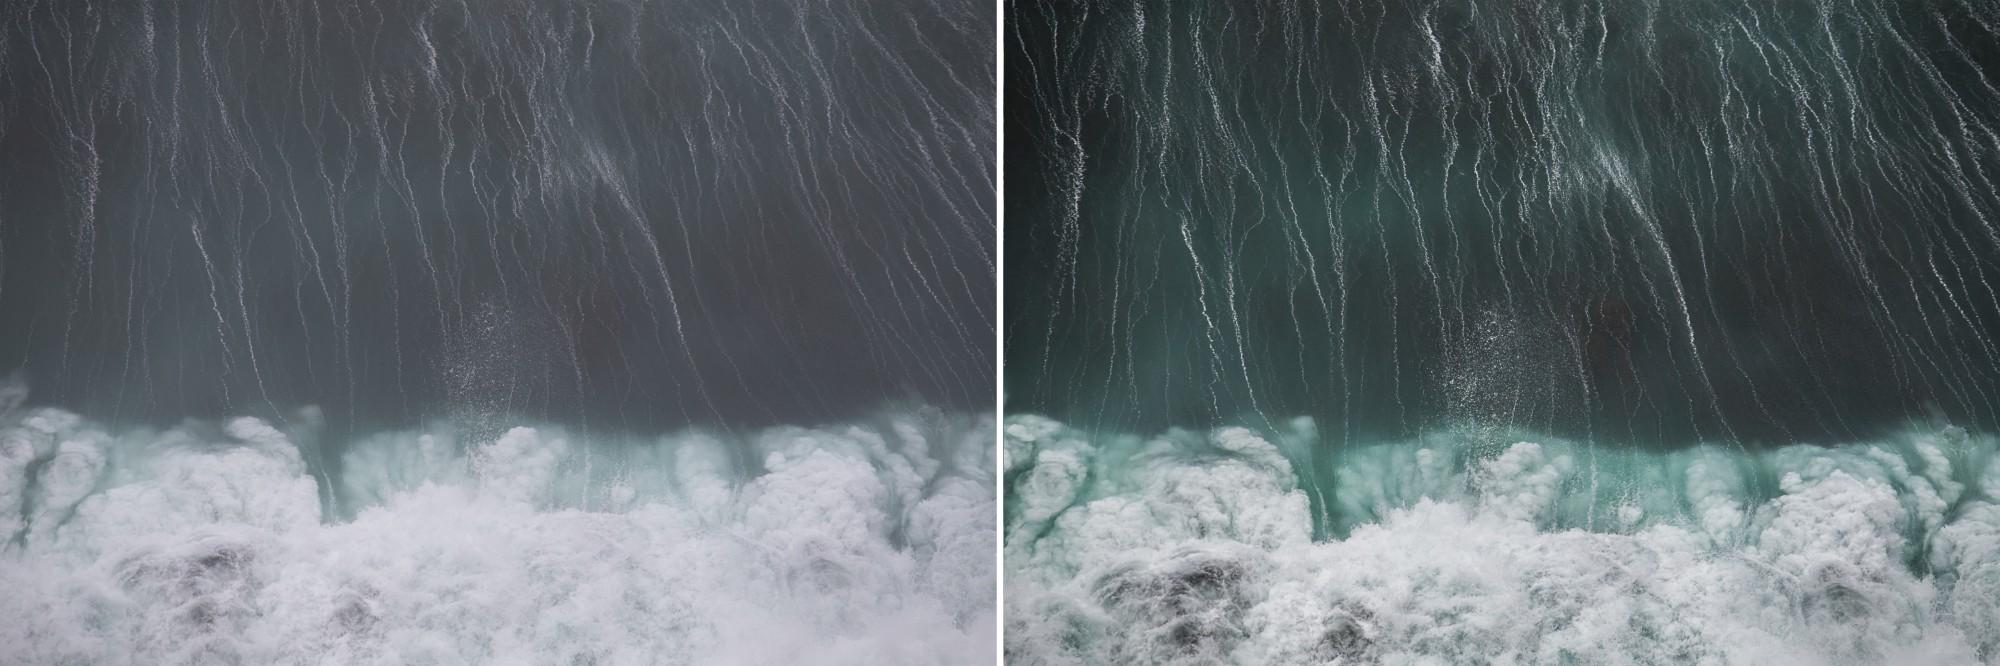 crashing waves in hawaii editing process